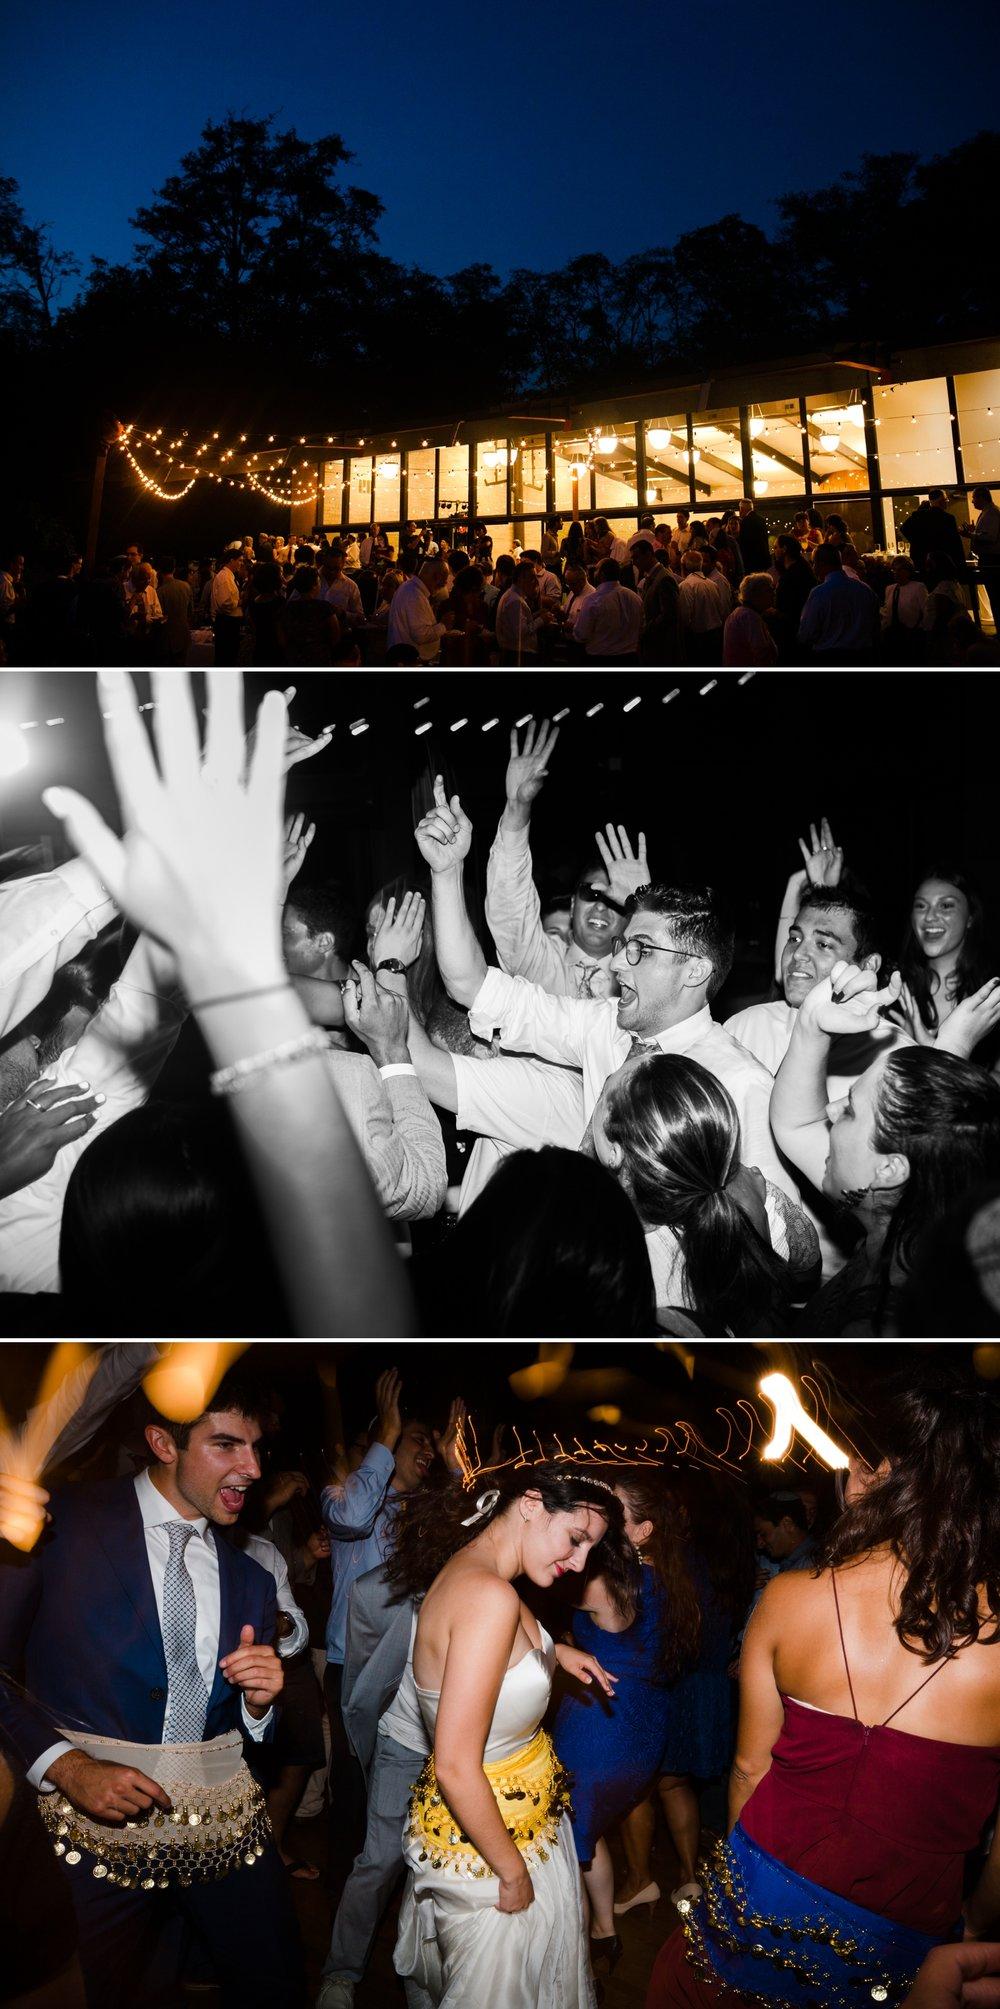 21-fun-dancing-wedding-reception-seattle.jpg